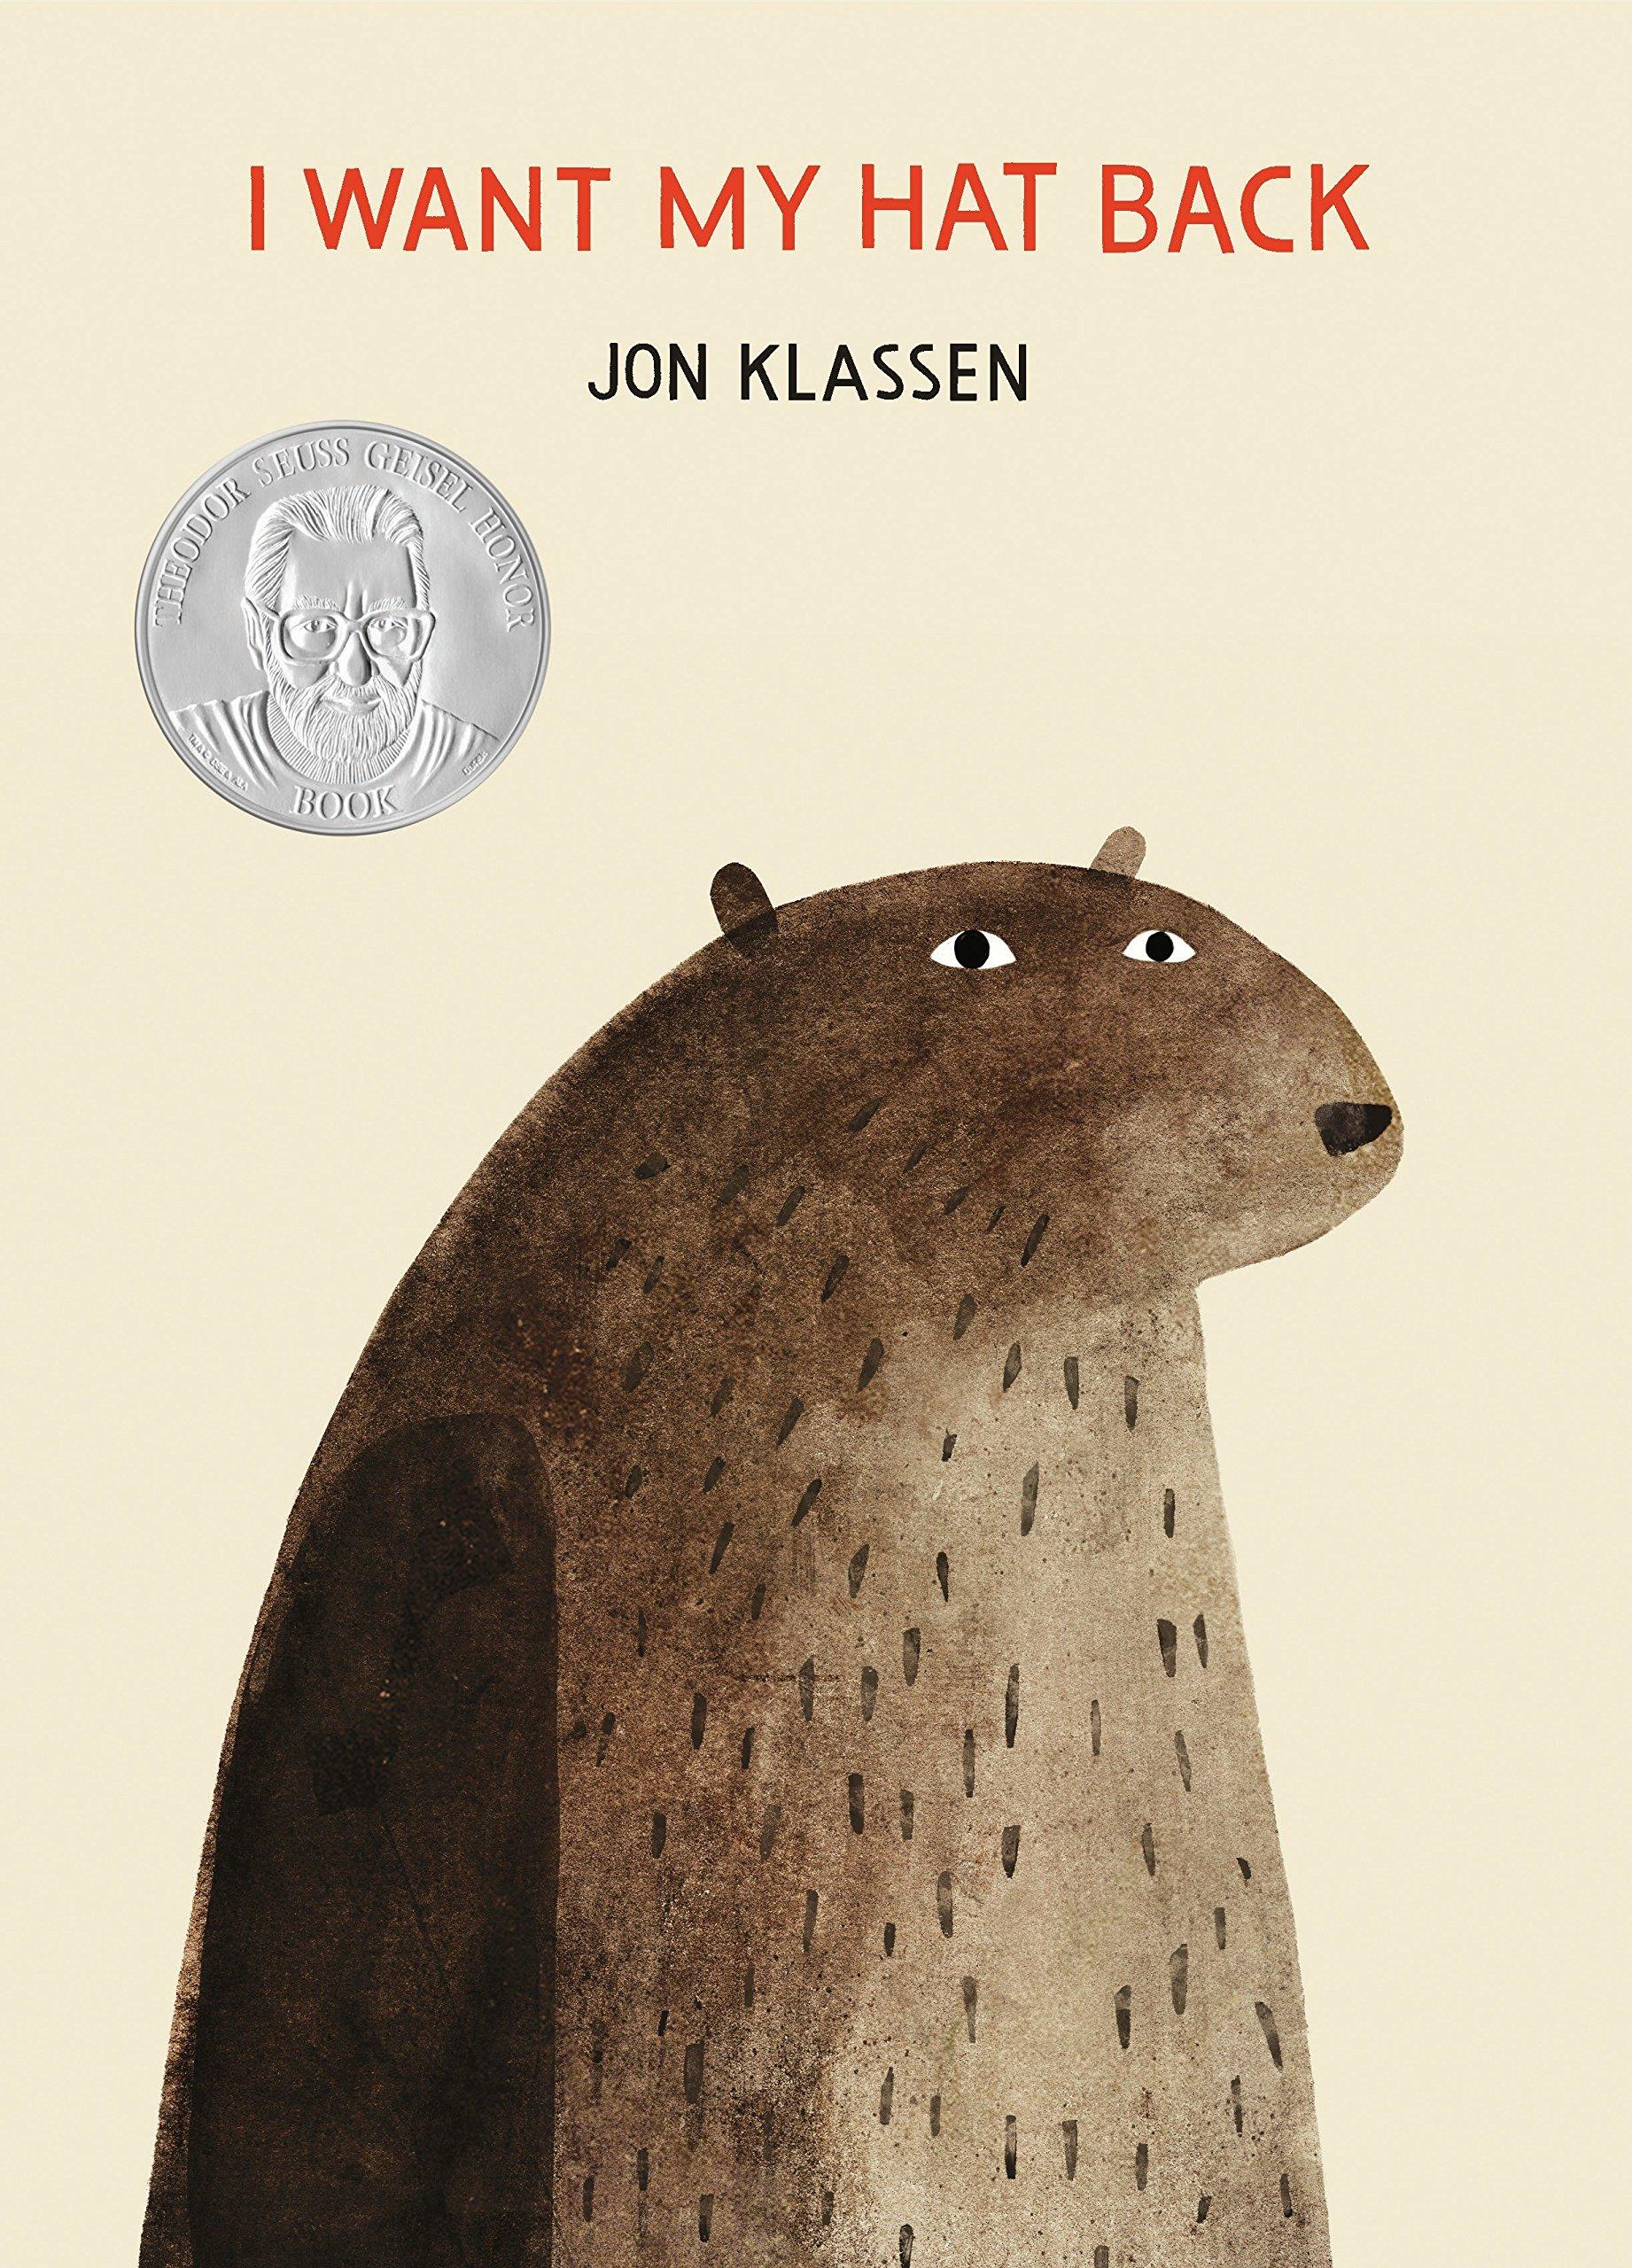 Amazon.com: I Want My Hat Back (9780763655983): Klassen, Jon, Klassen, Jon:  Books